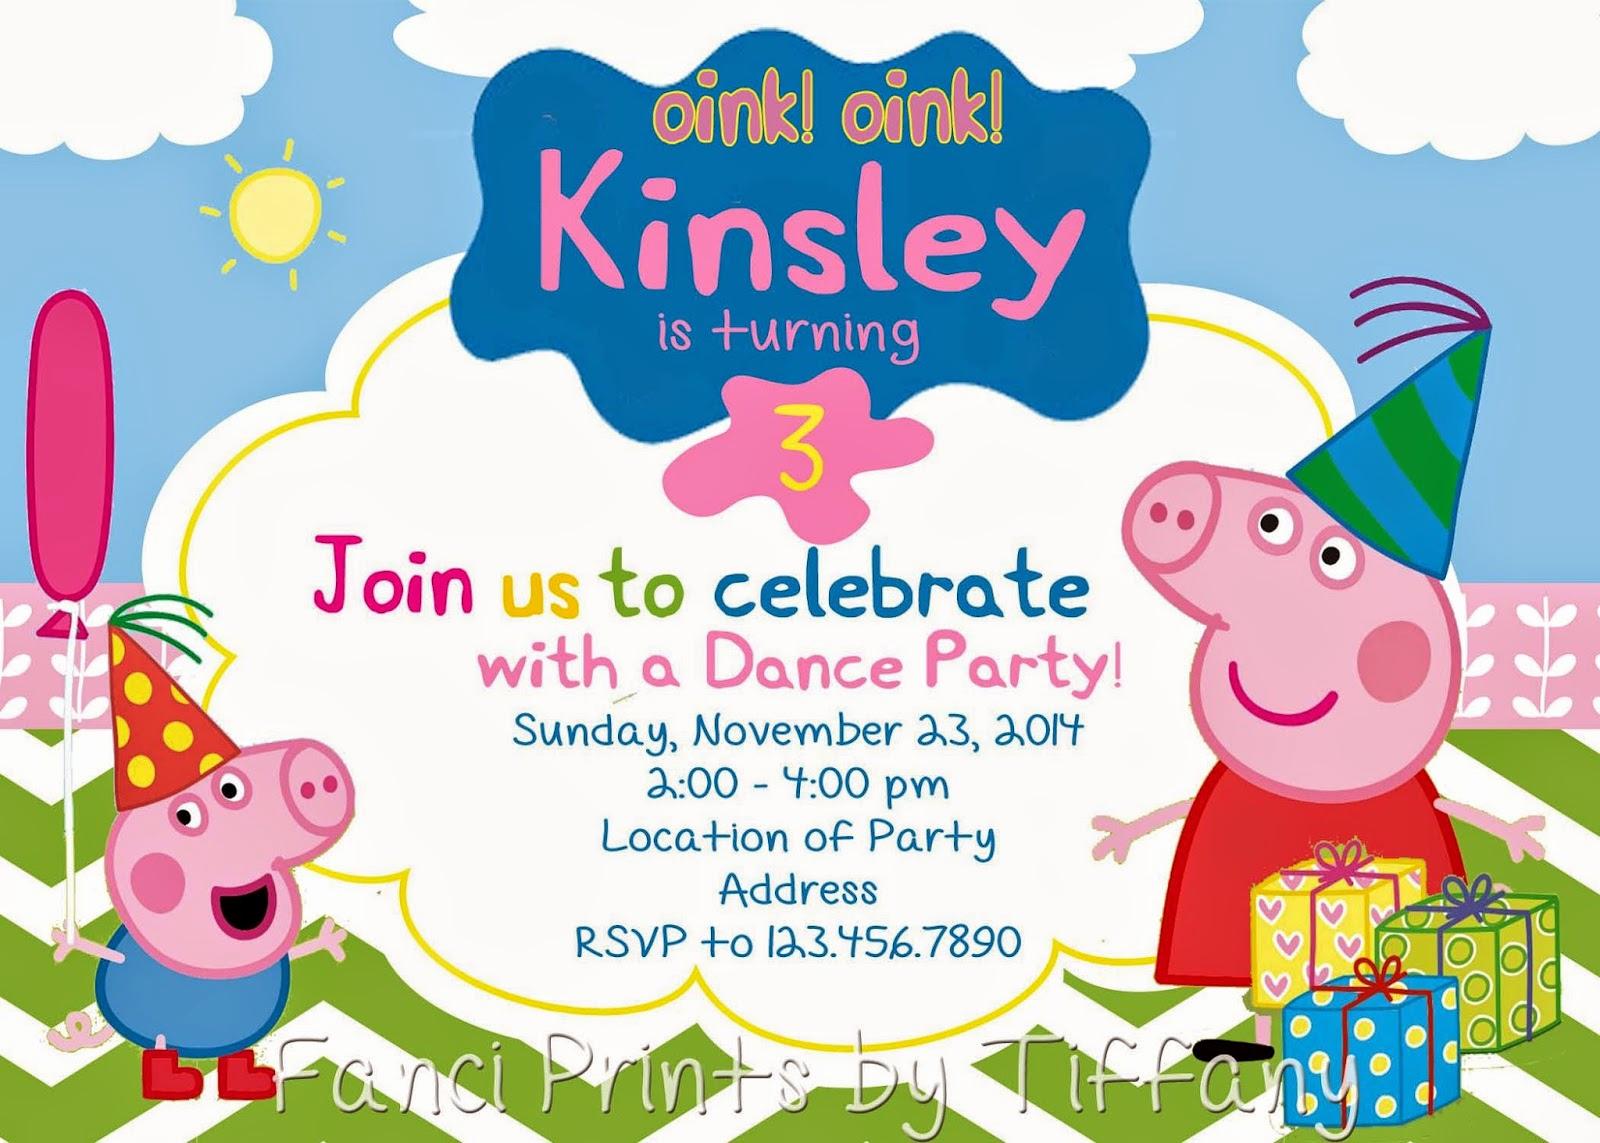 Peppa Pig Invitation Template Free Inspirational Fanci Prints by Tiffany